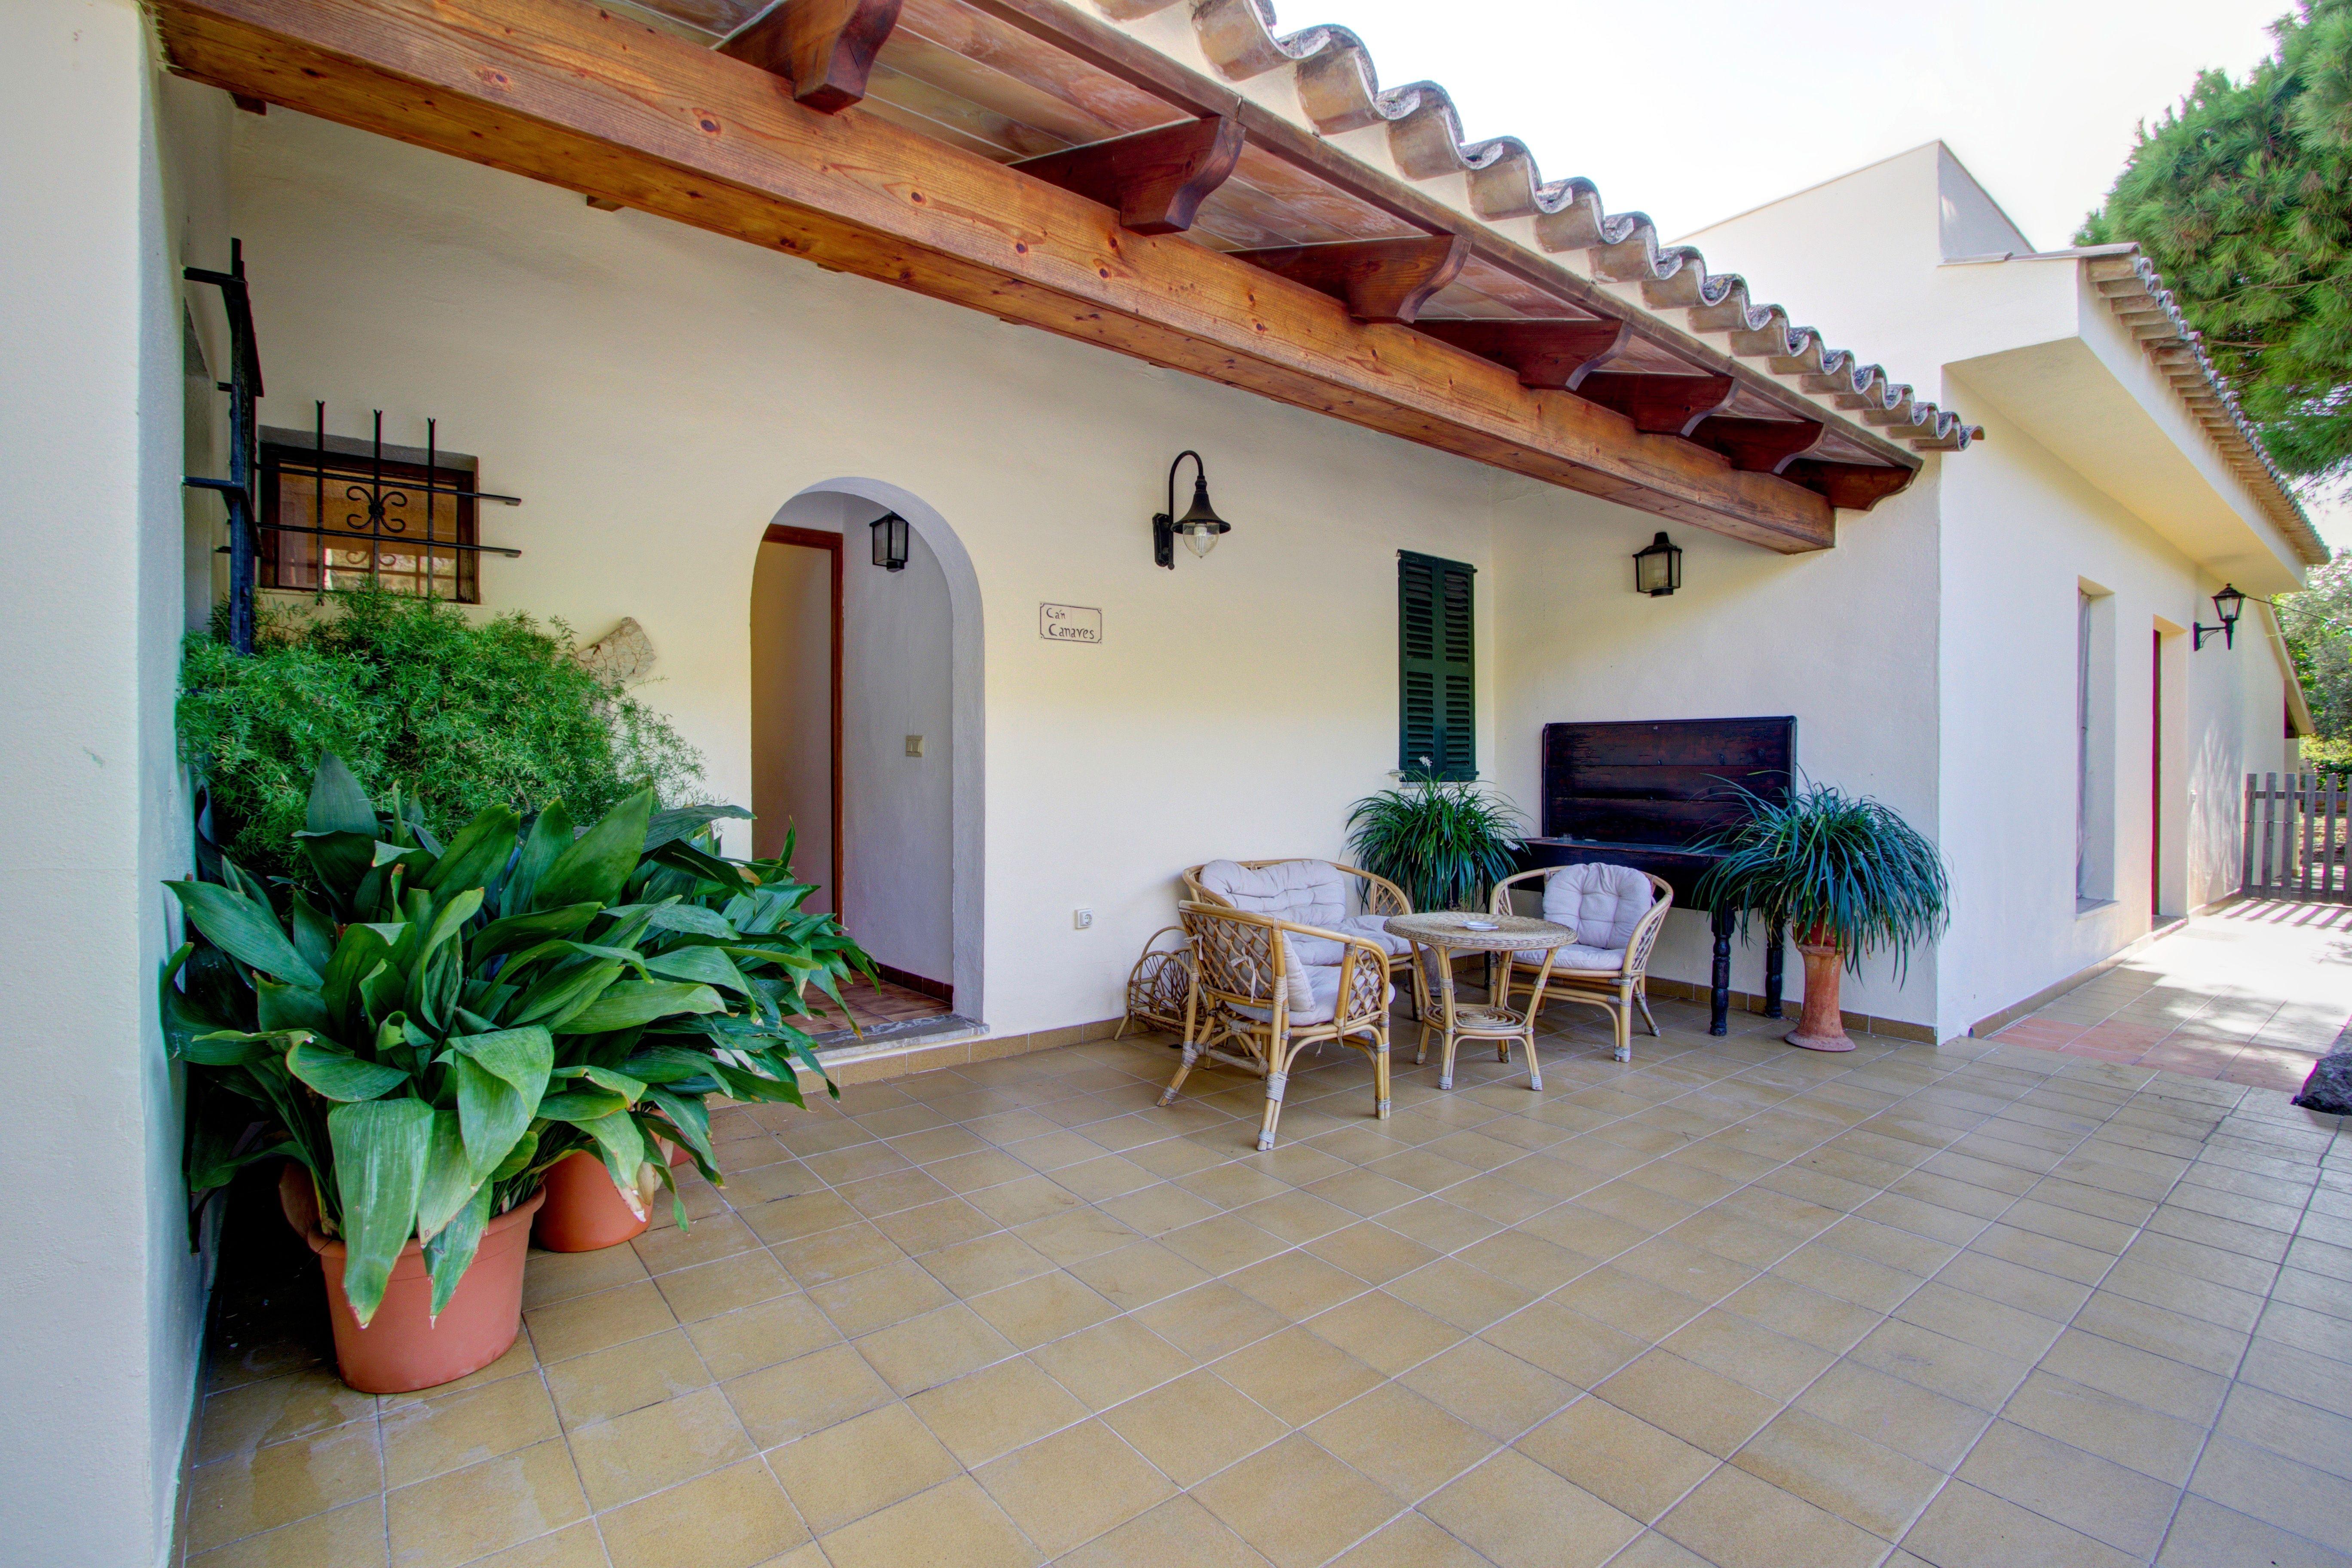 villas in mallorca Holiday apartments, Holiday villa